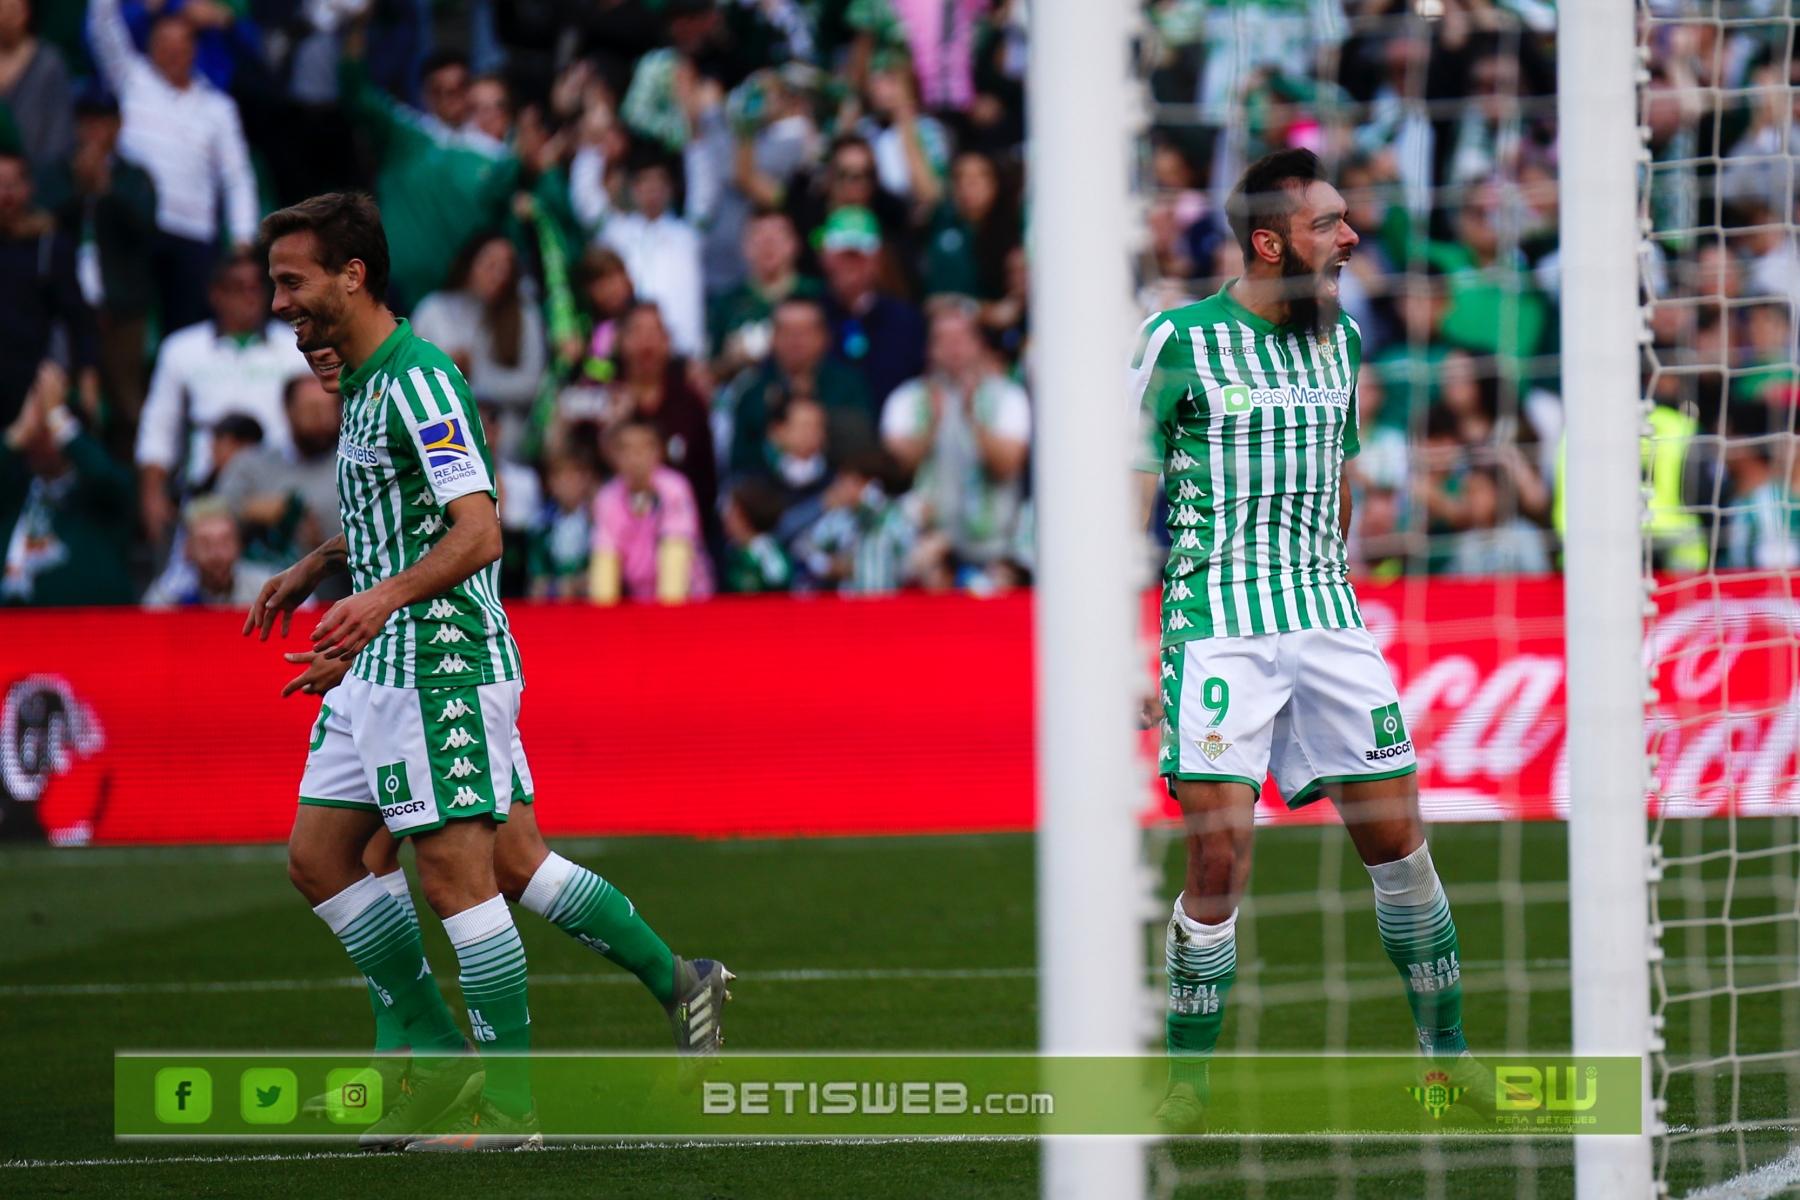 aJ20 Real Betis - Real Sociedad 28